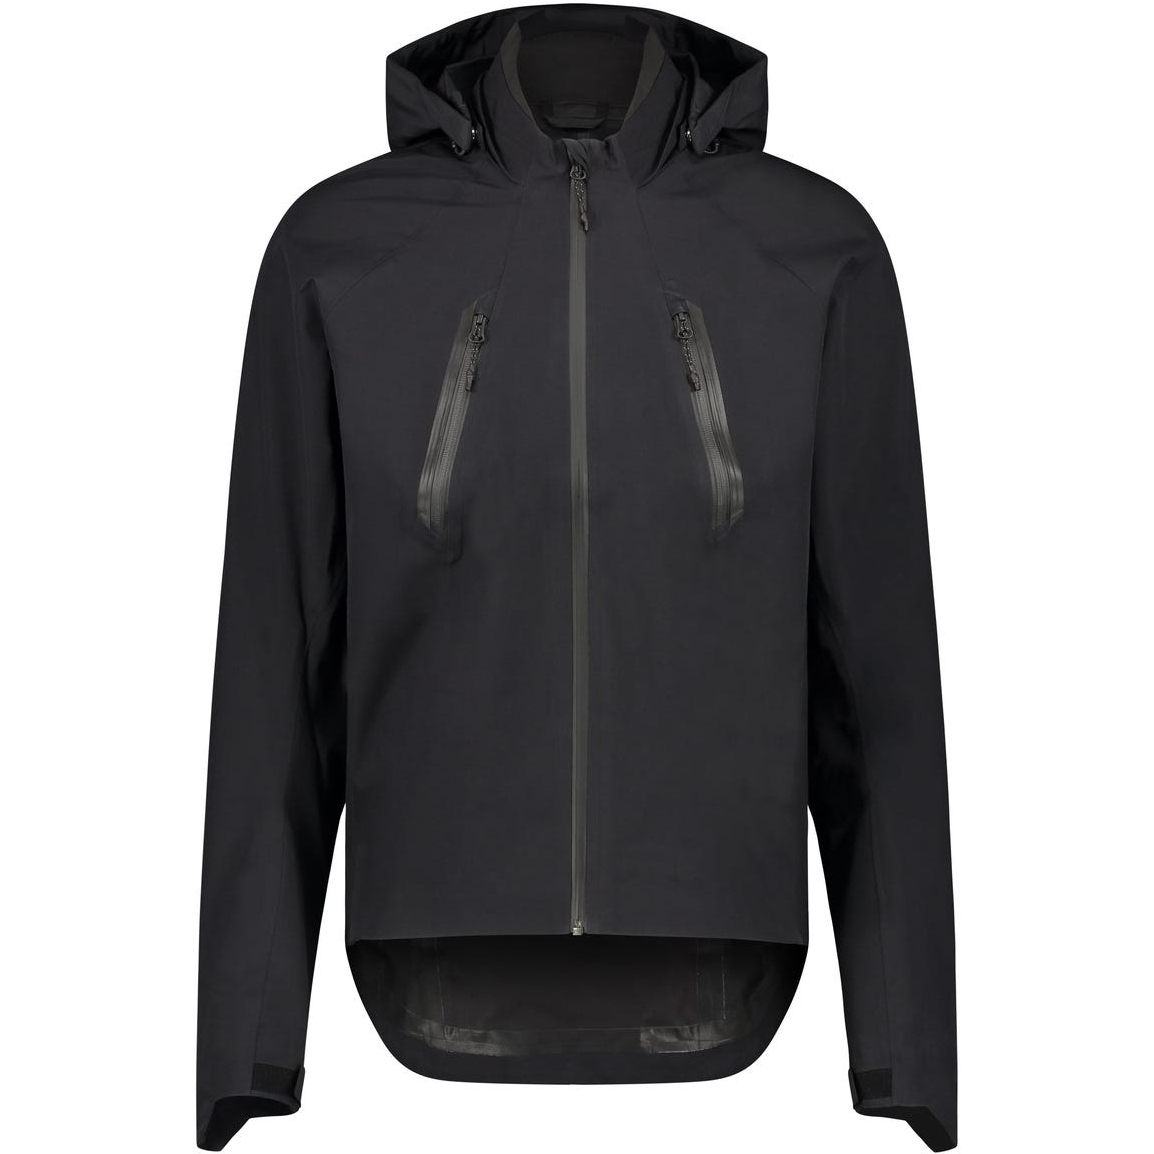 AGU Commuter Premium 3L Rain Jacket - black